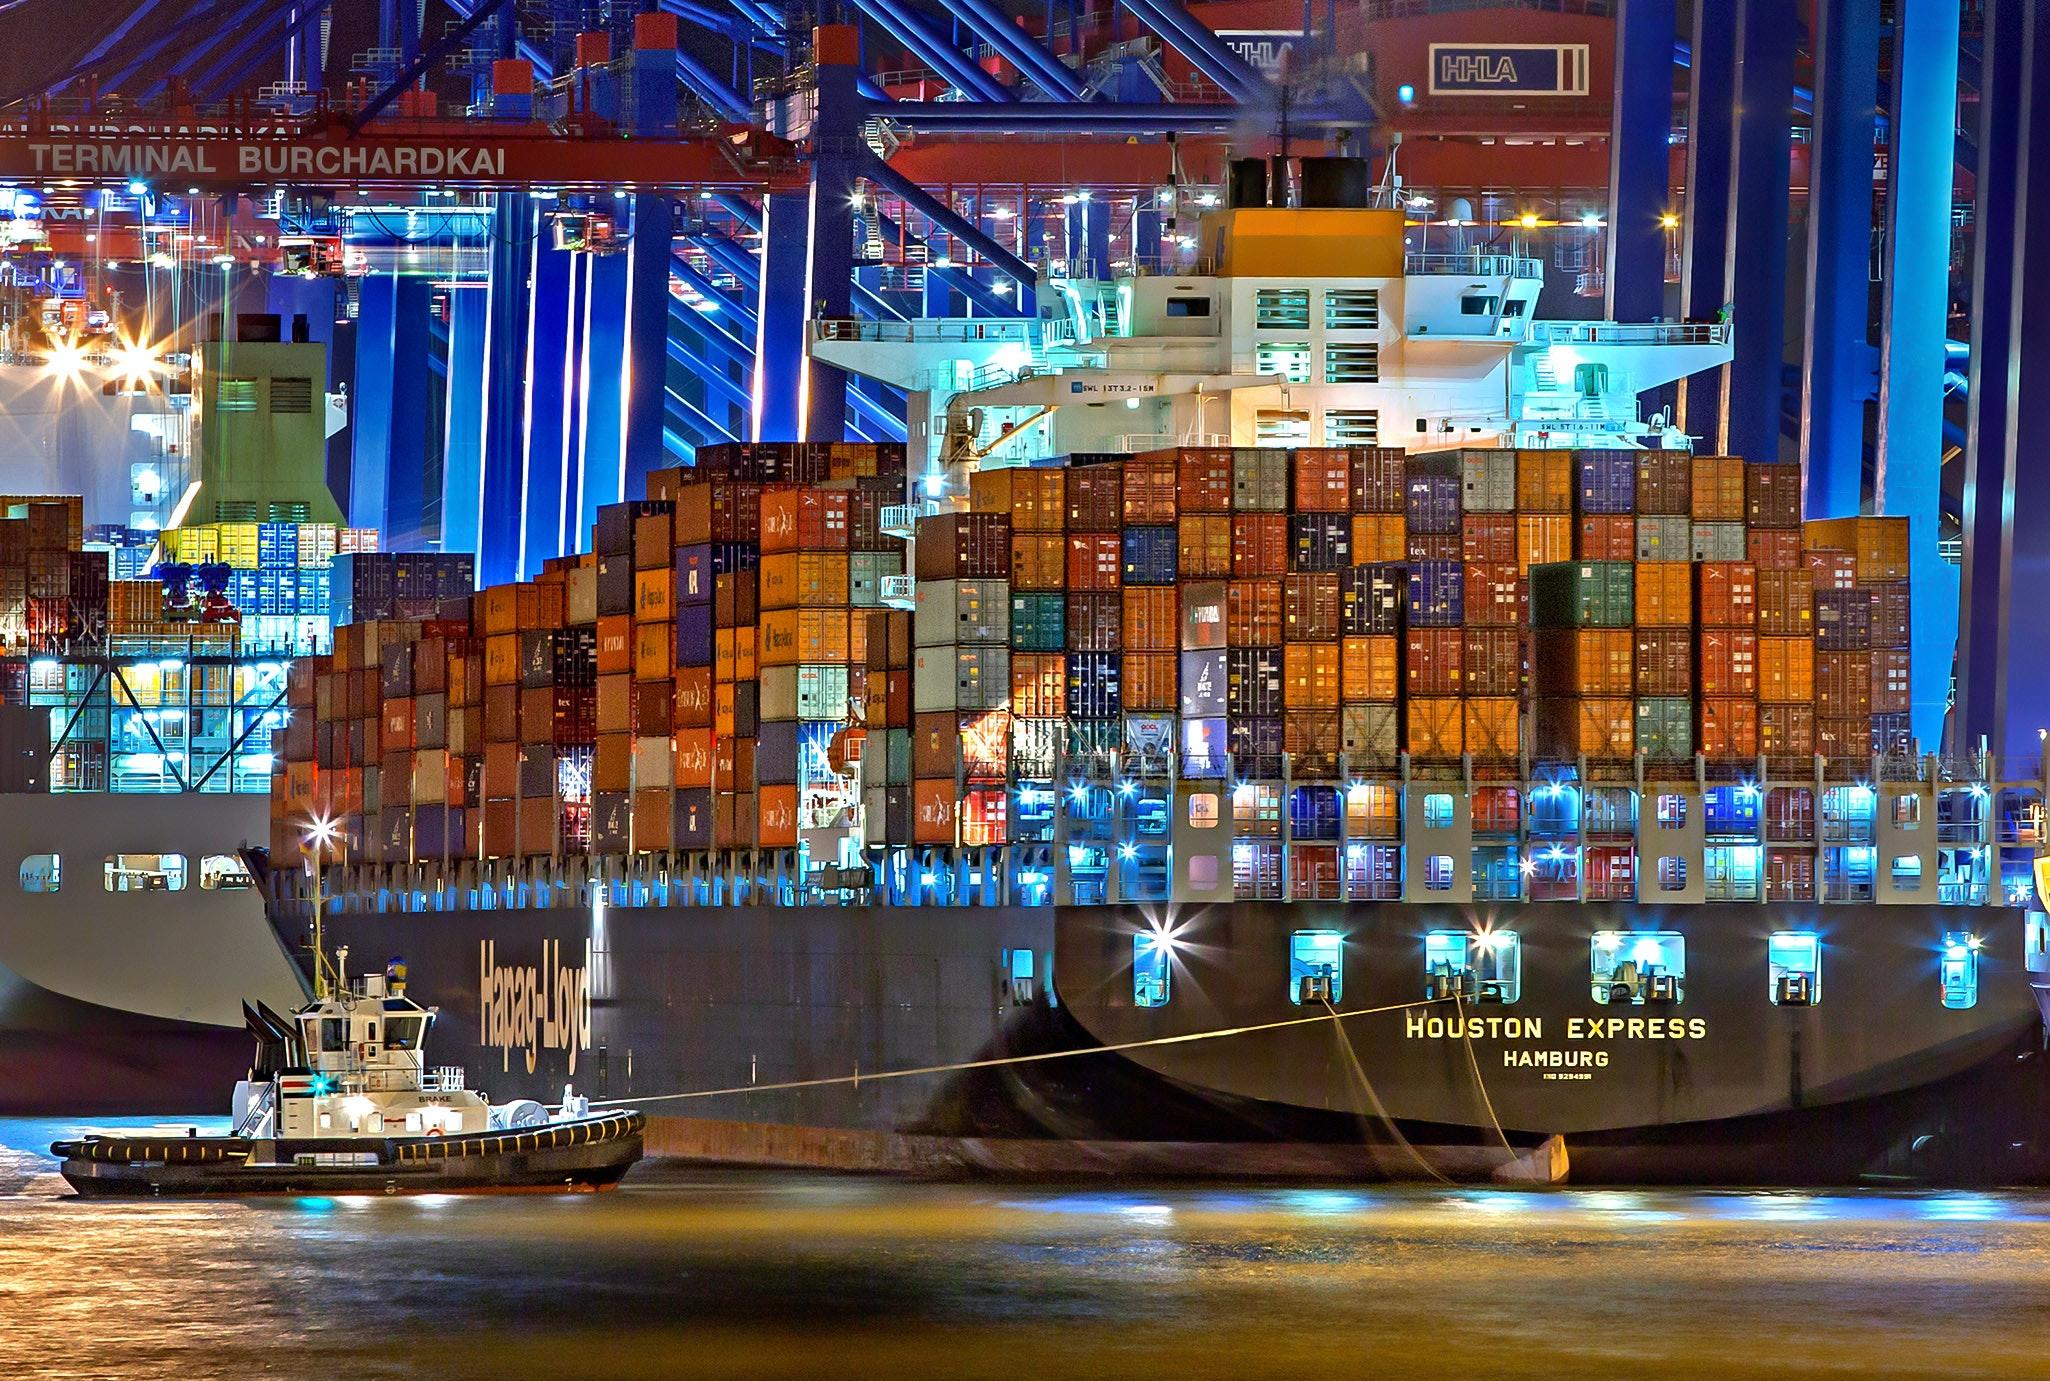 Wir passen uns stetig an internationale Handelsbeziehungen an